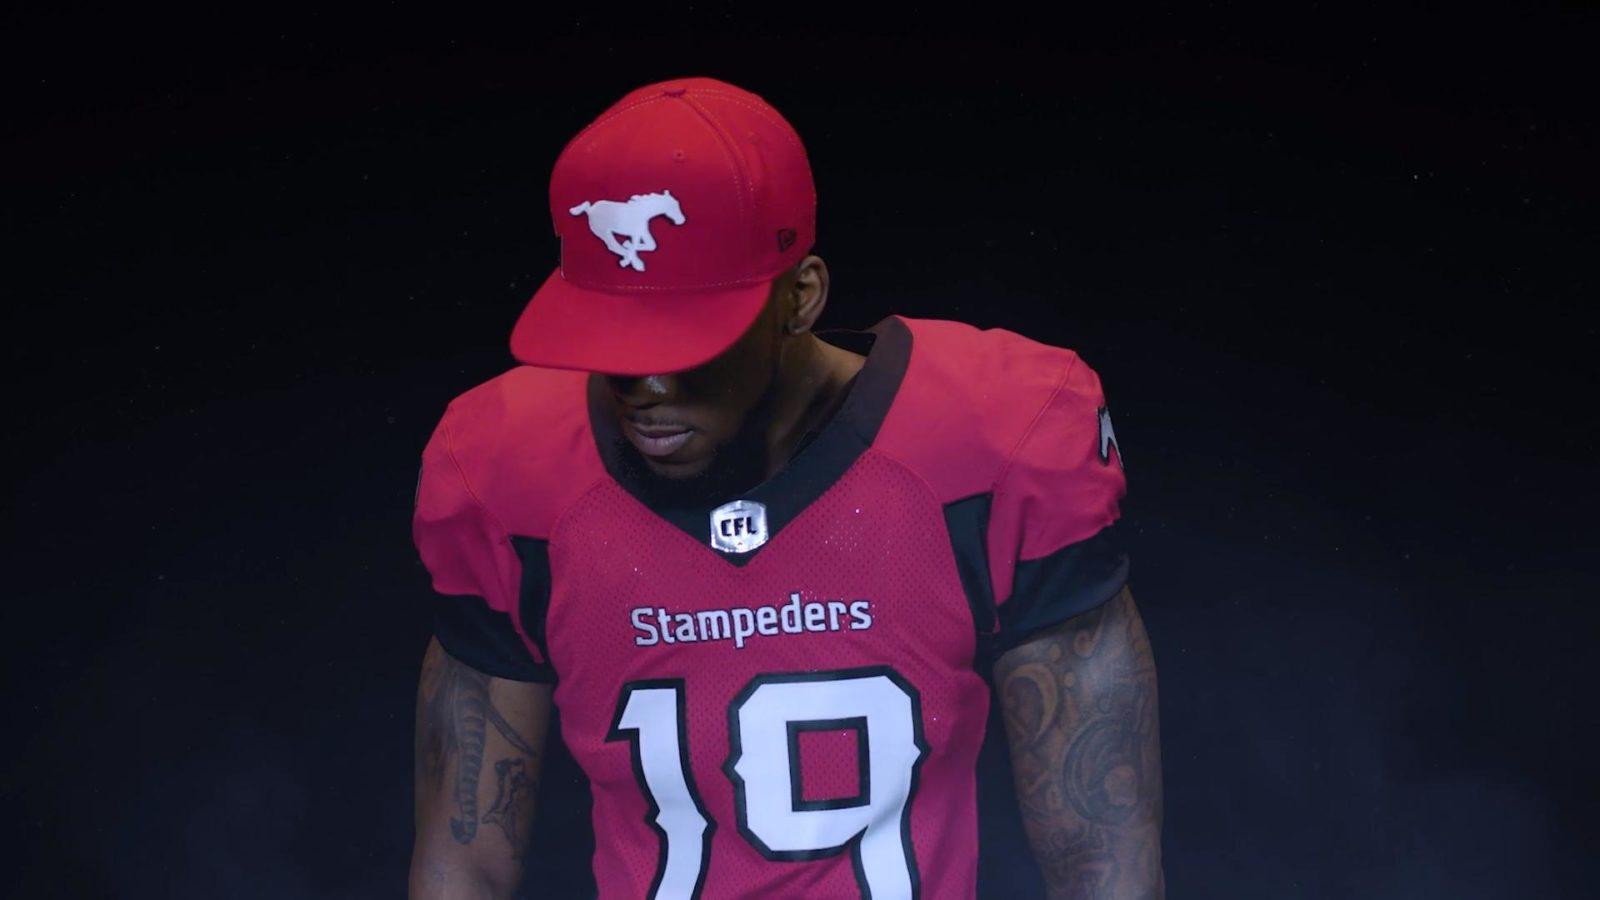 Cfl X New Era 2019 Calgary Stampeders